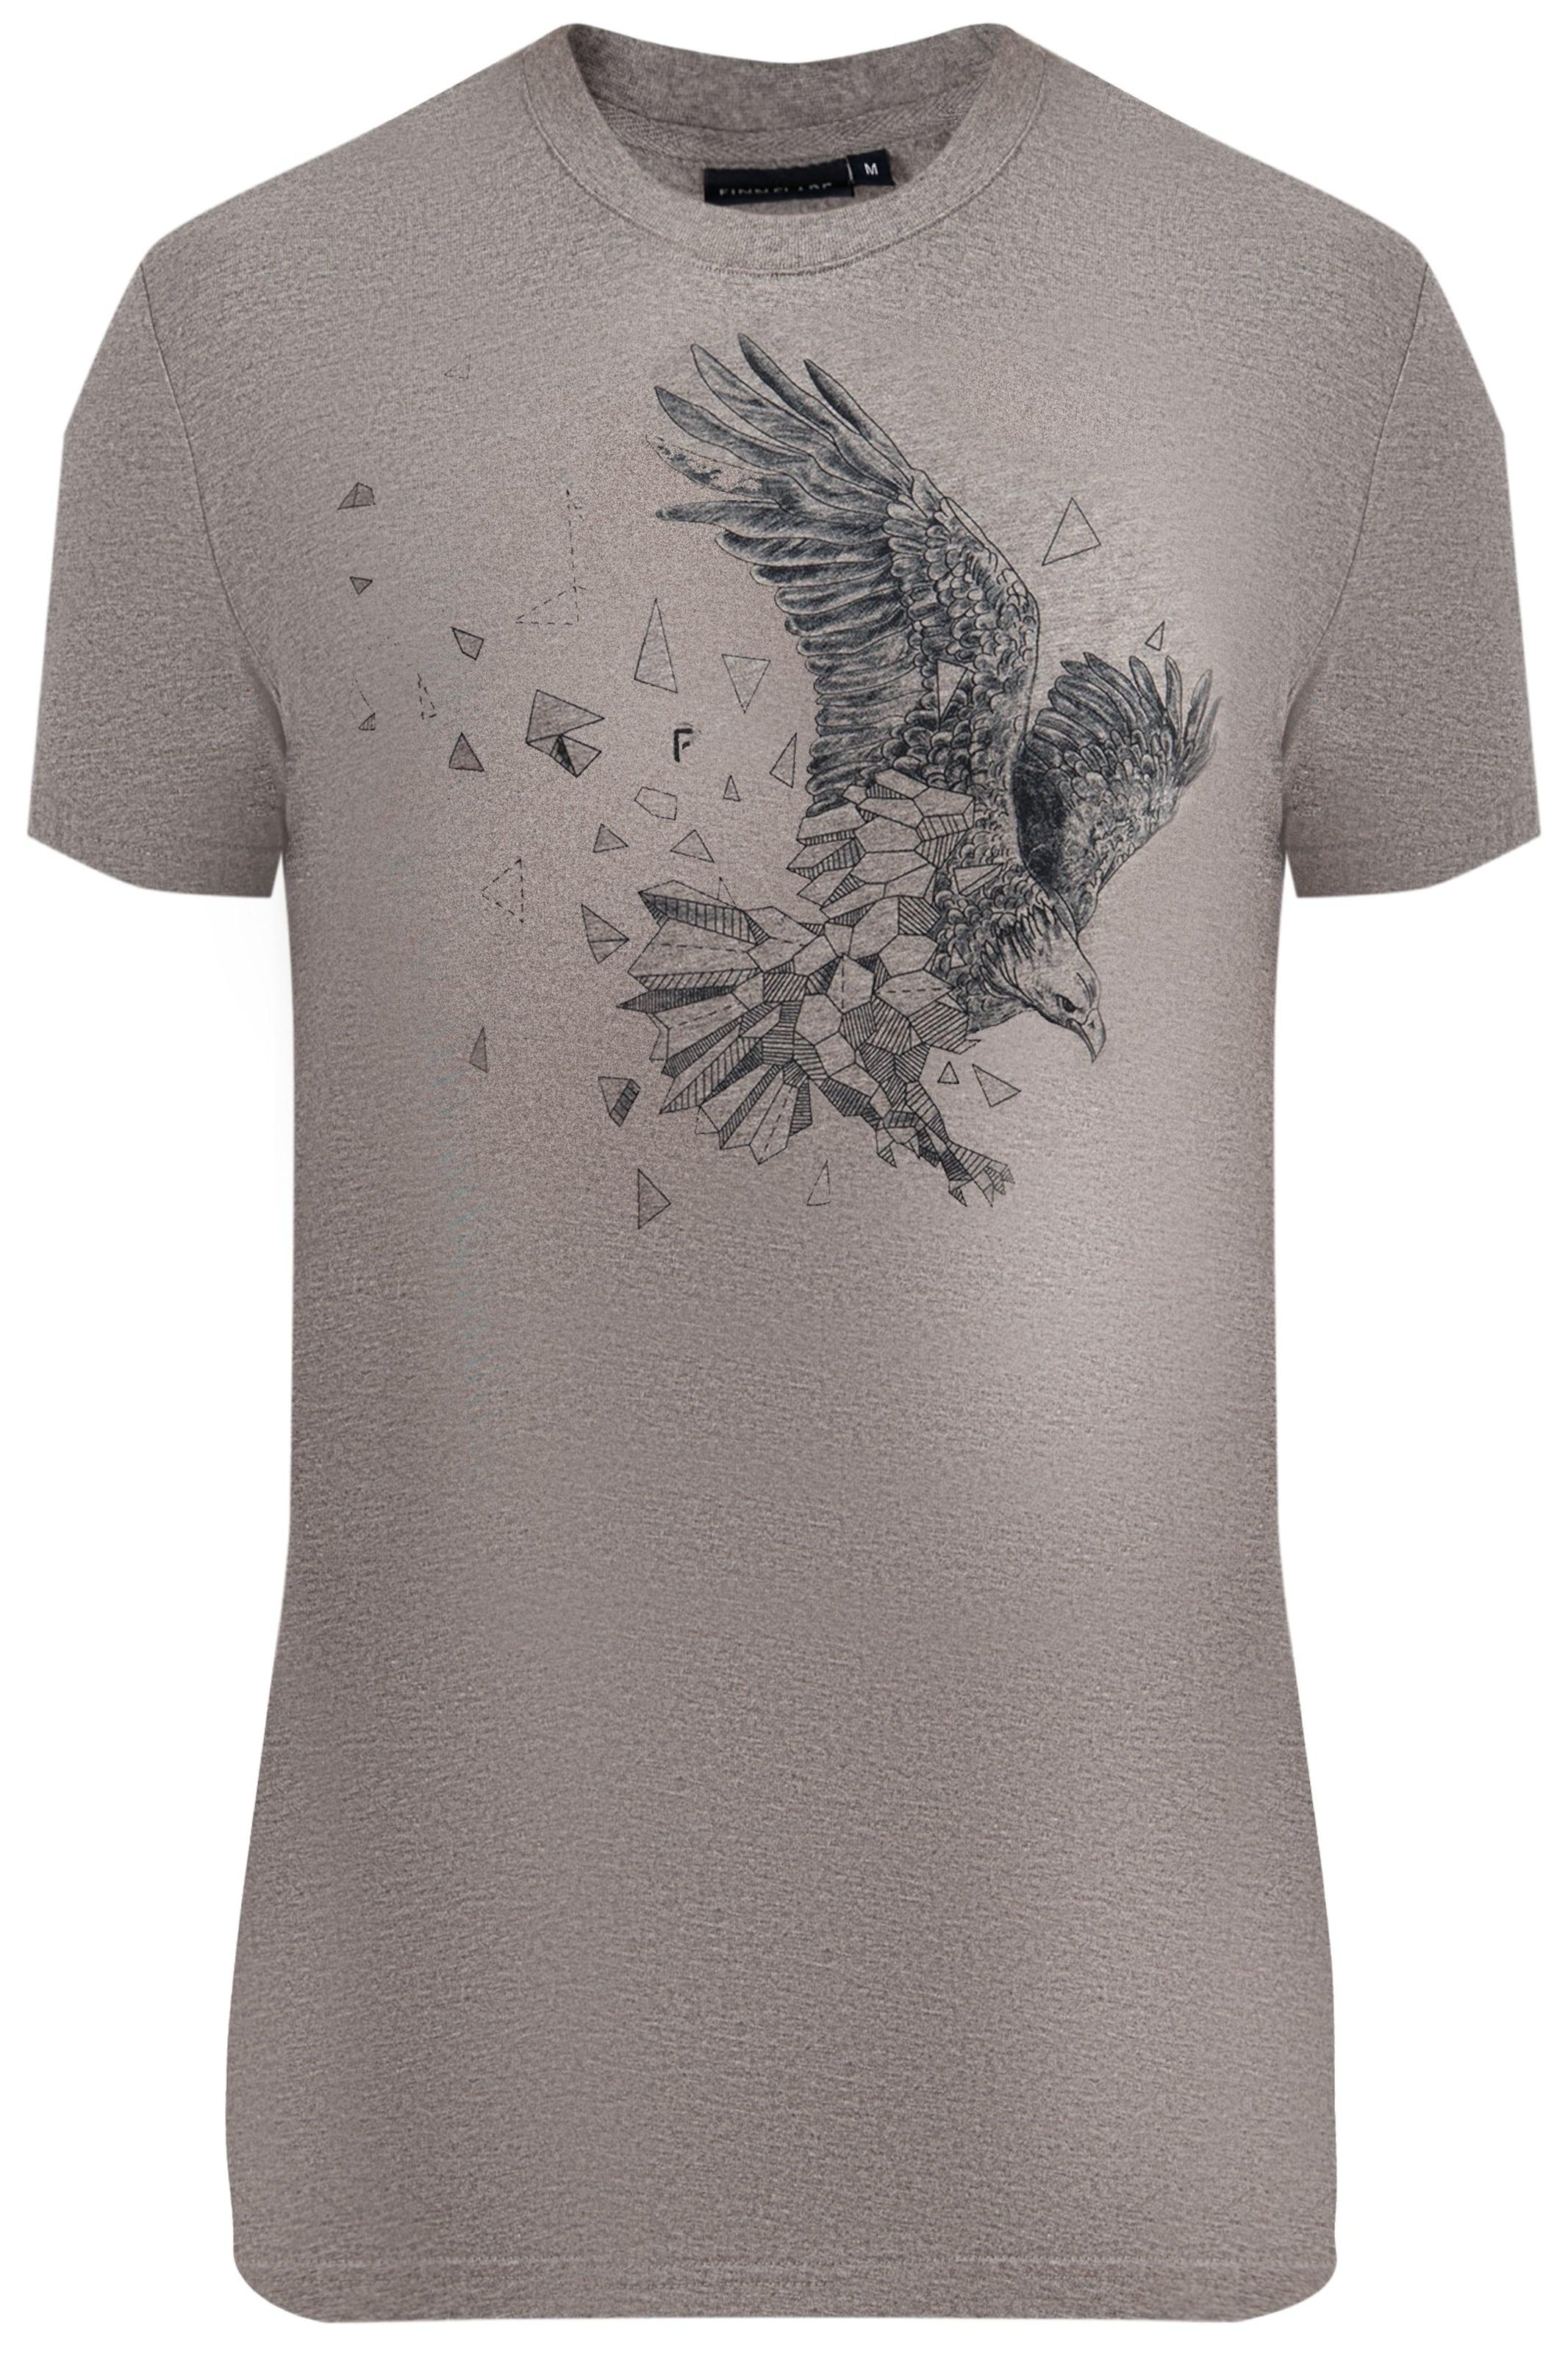 T Flare shirt TaupeSchwarz In Finn NwX0Pk8nO